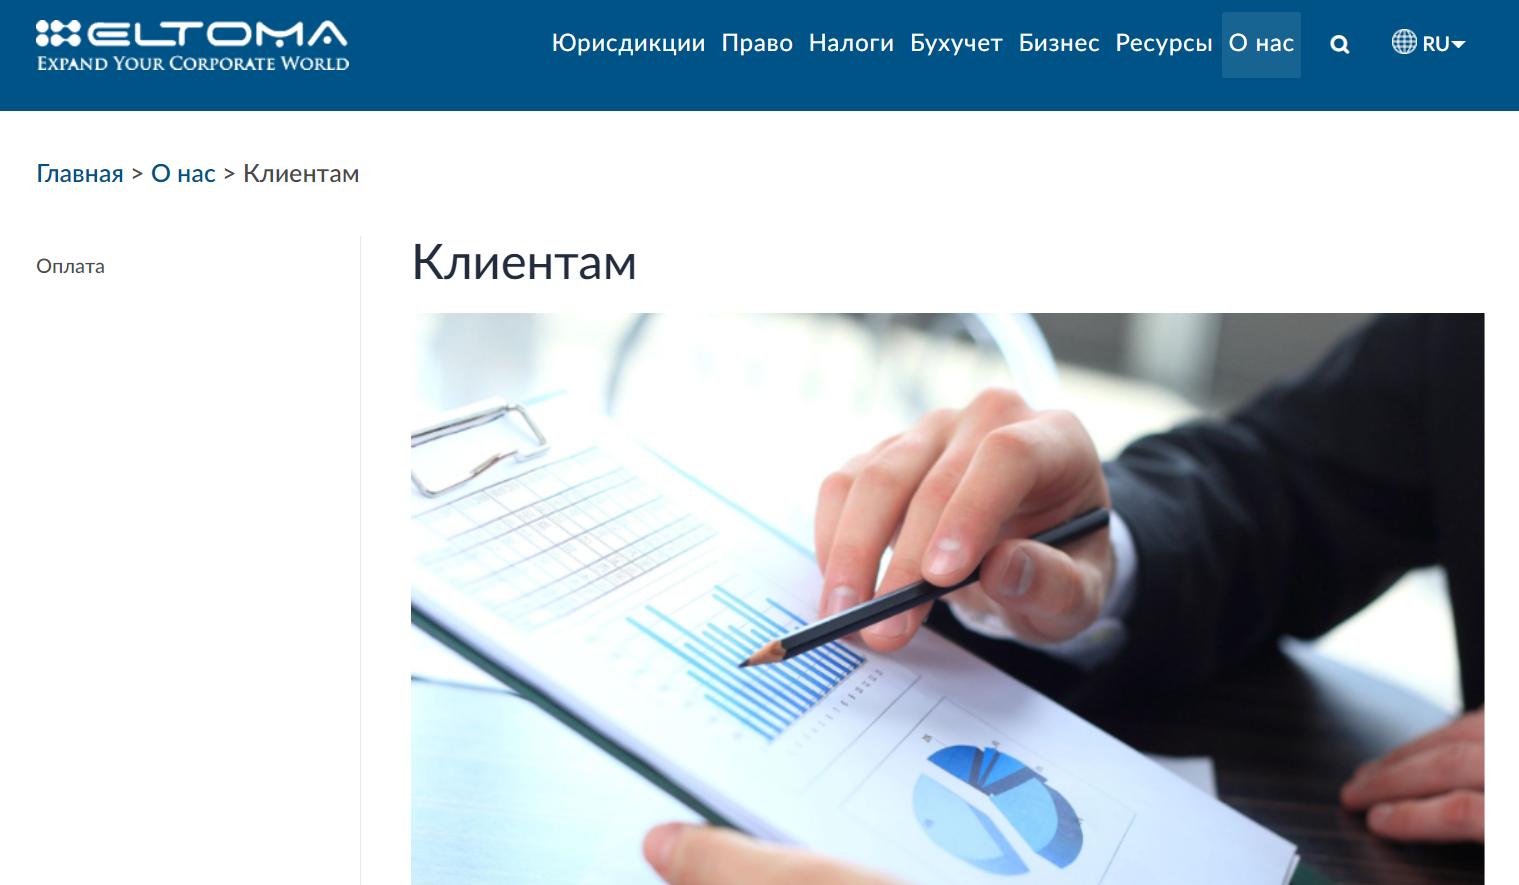 Какие услуги предлагает Eltoma Corporate Services?